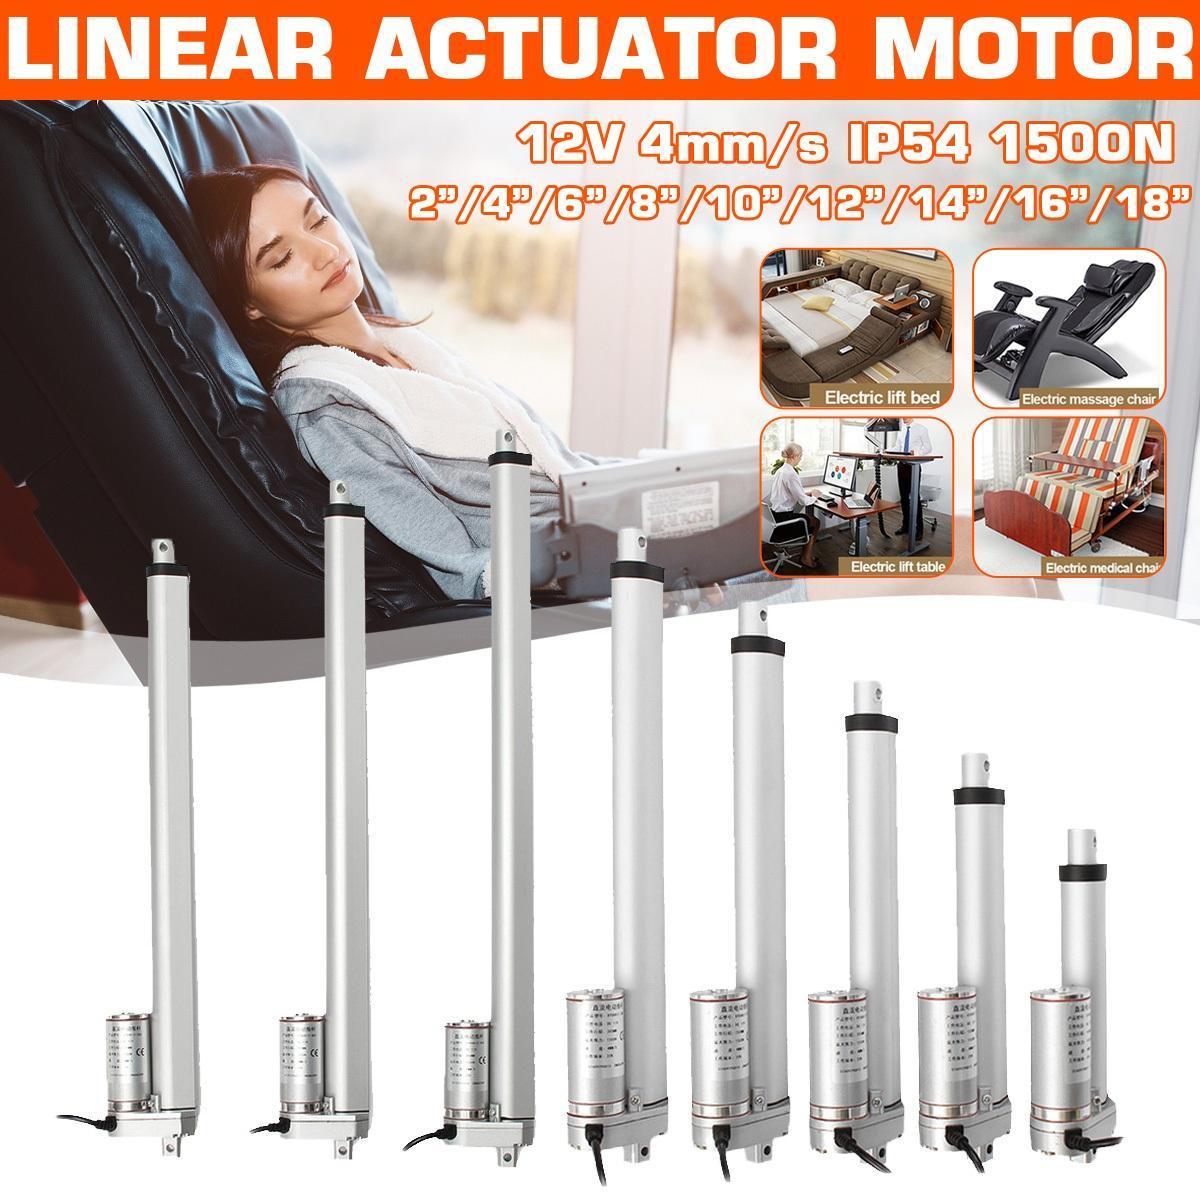 Motor lineal eléctrico de 4/6/8/10/12/14/16/18 pulgadas cc 12V 1500N, actuador lineal ajustable, Motor de actuador lineal de Metal